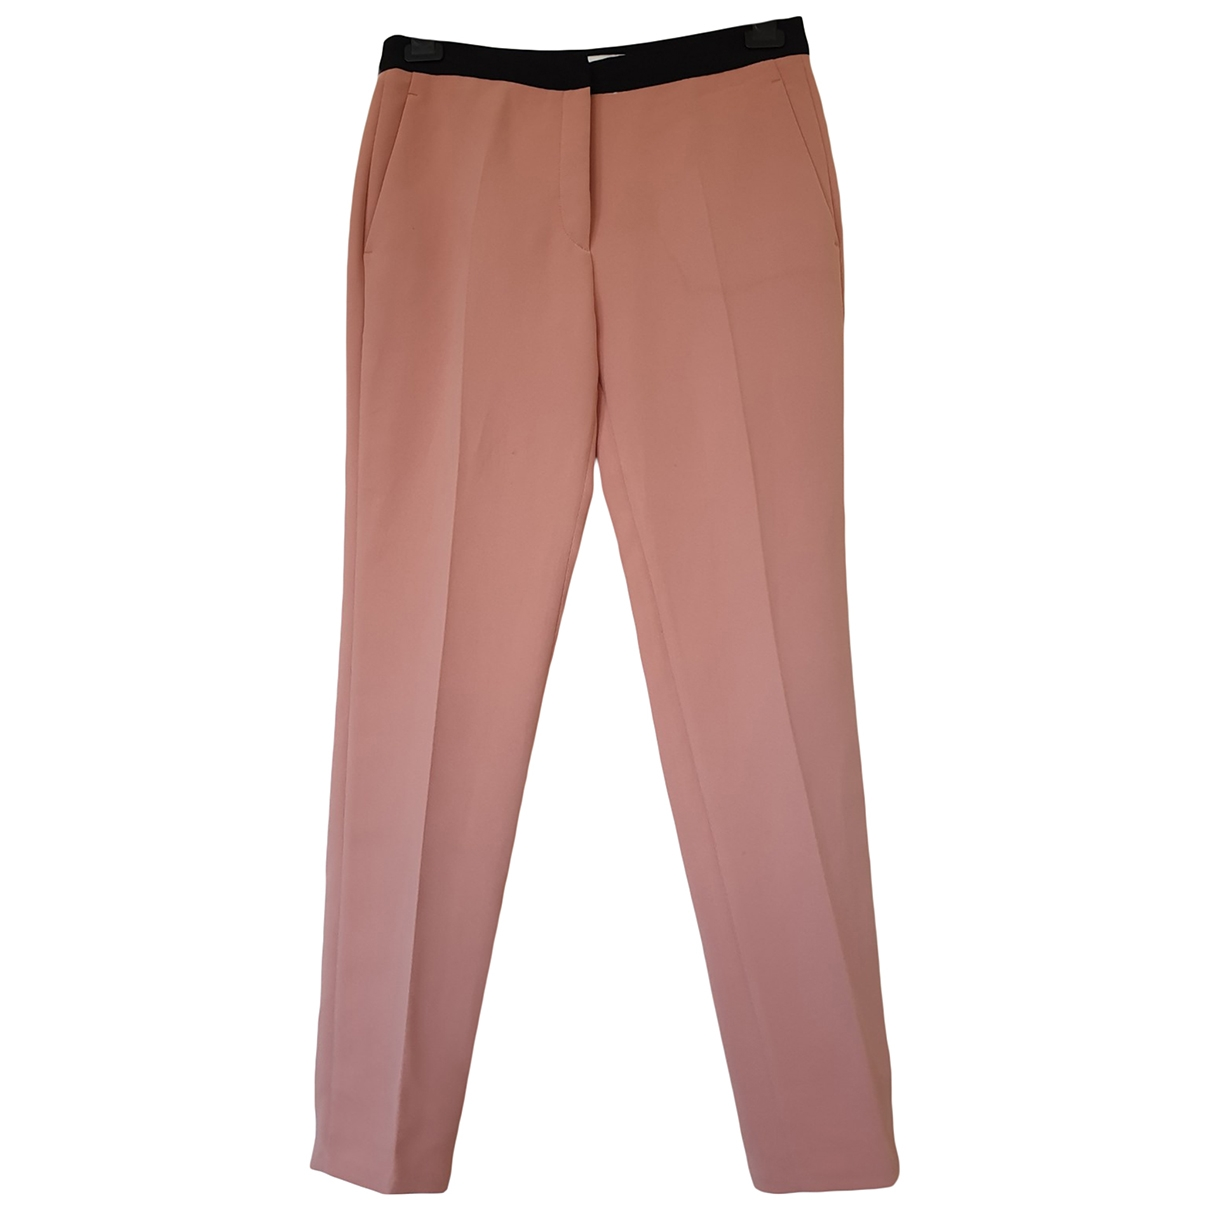 Sandro \N Pink Trousers for Women 36 FR